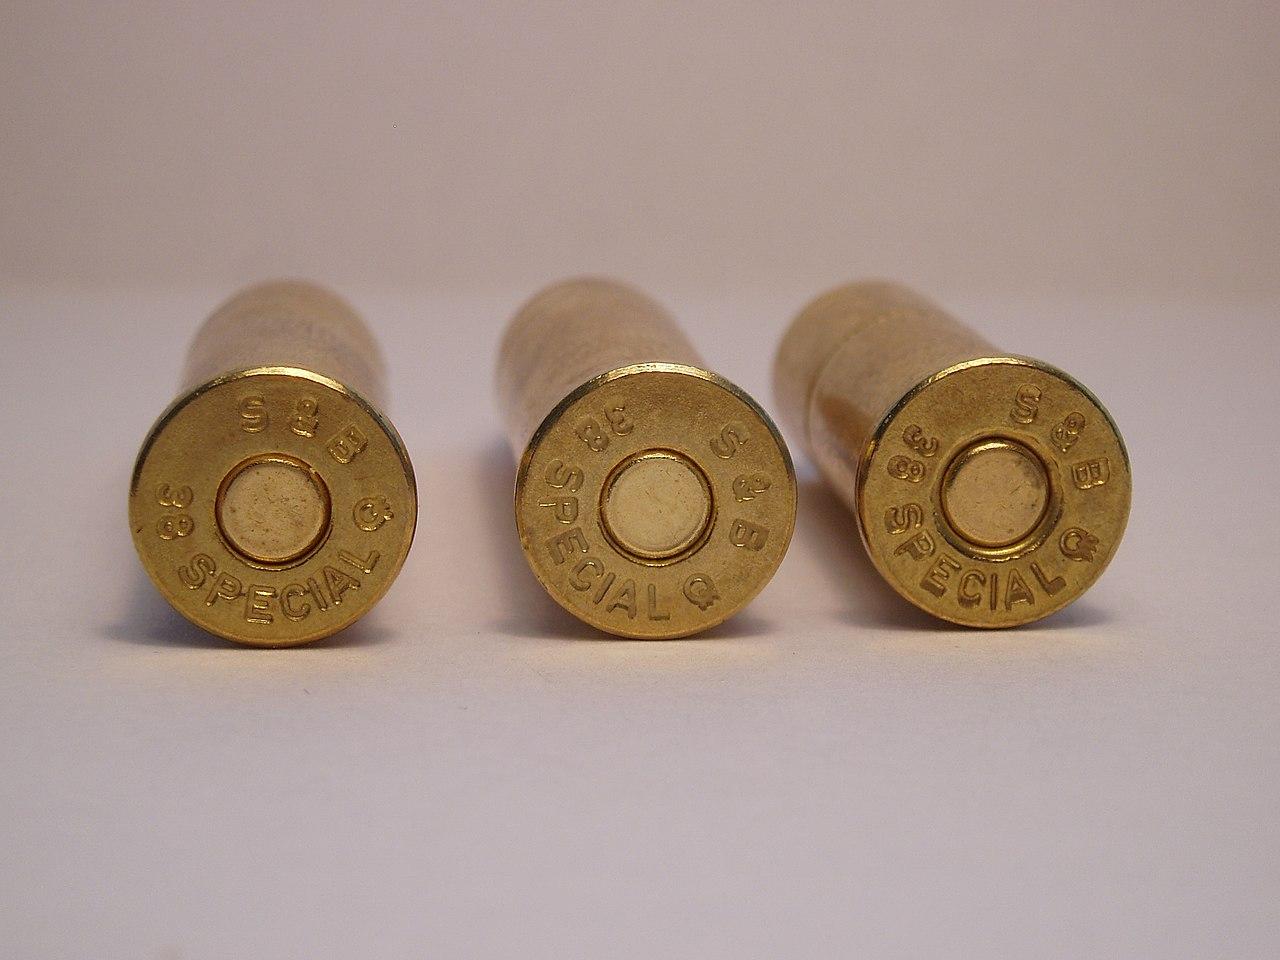 38 Special - FMJ, SP, WC - SB - 3.jpg